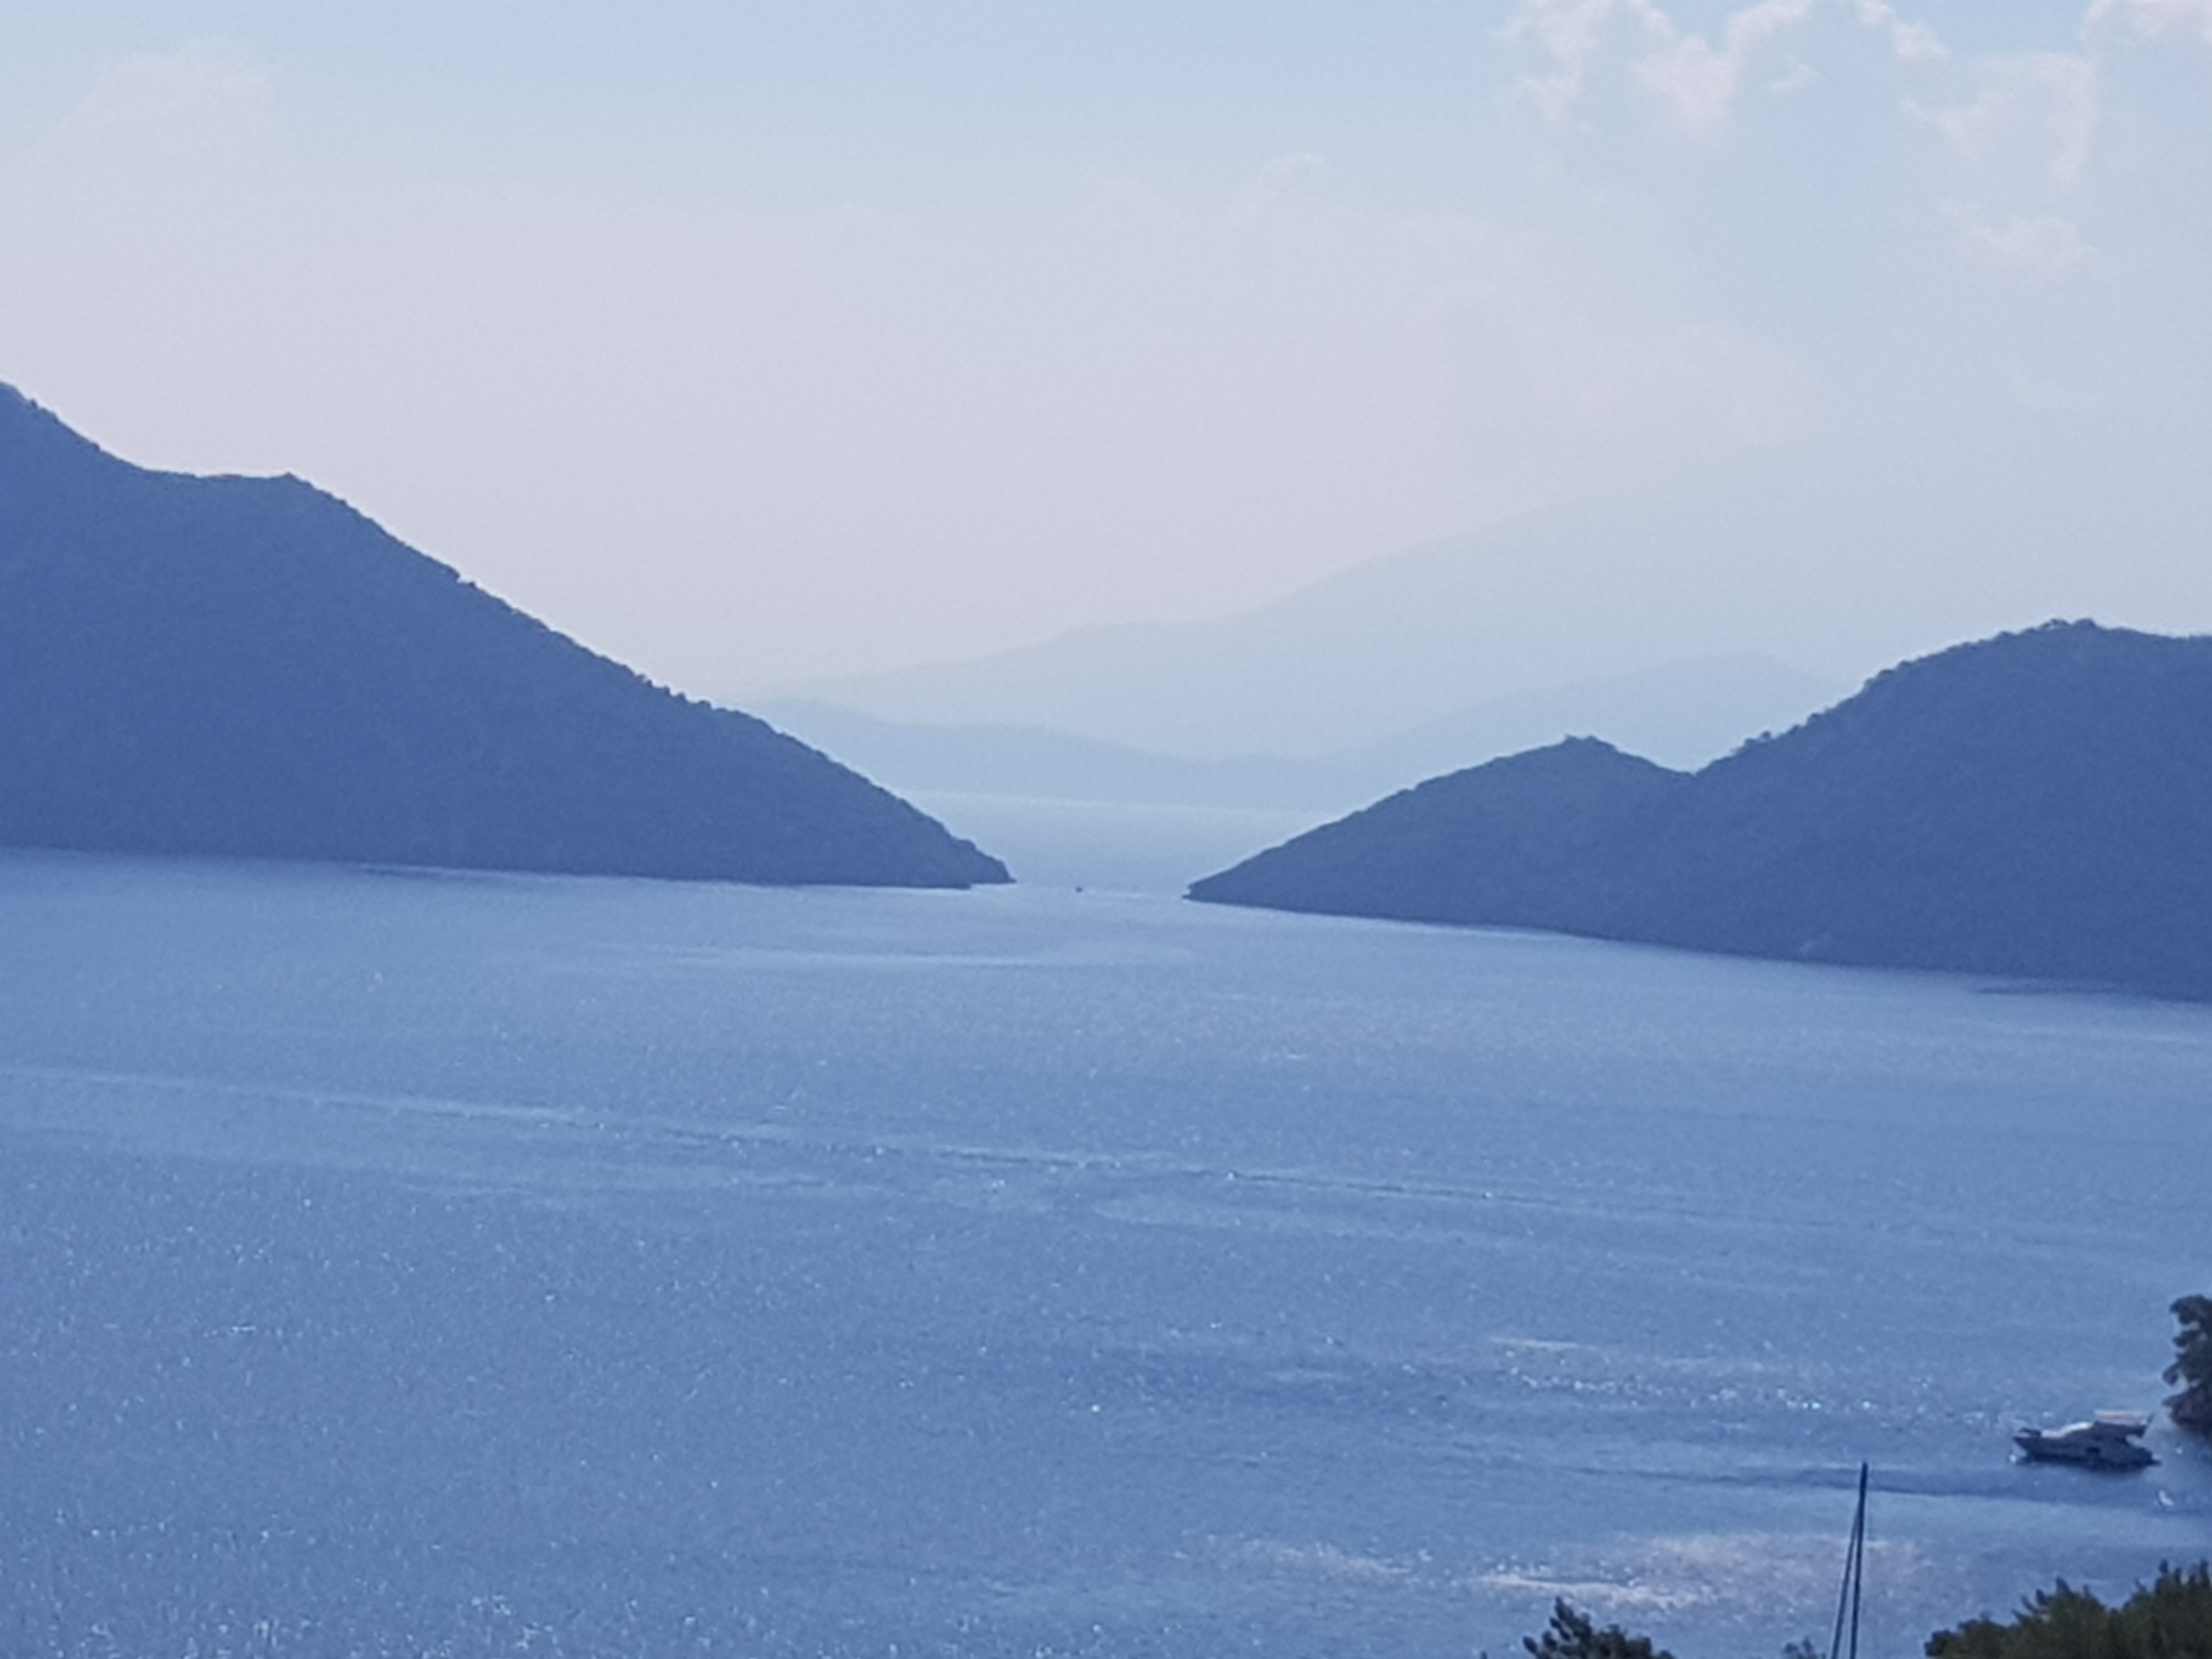 Море и горы в Турции, регион Даламан